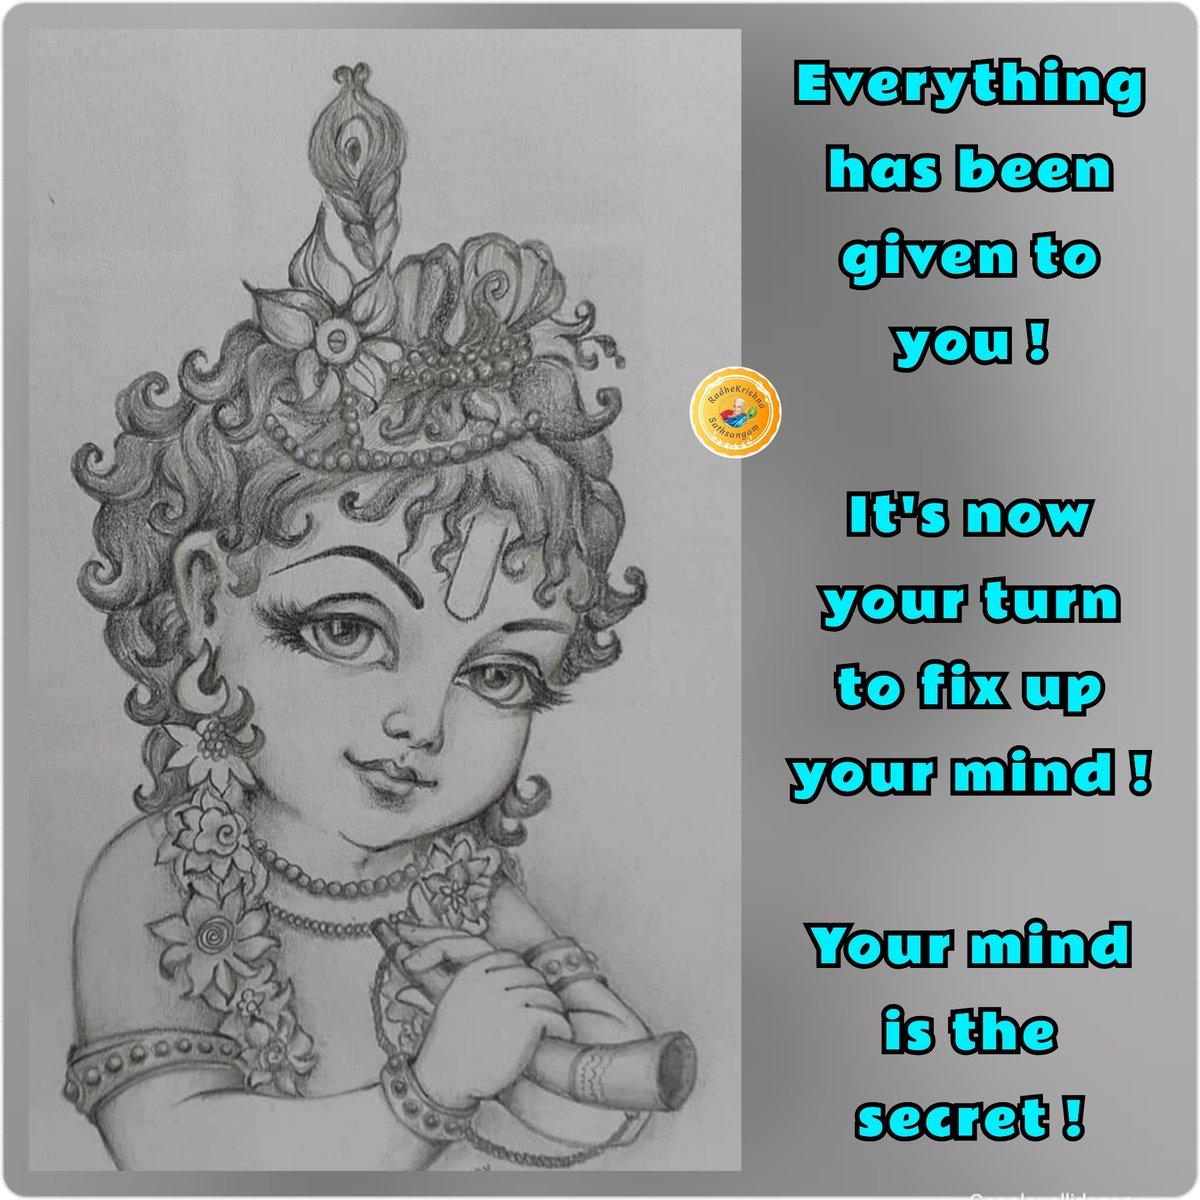 #radhekrishna   #KrishnaMessages   #Mindset https://t.co/majpAPSBjF